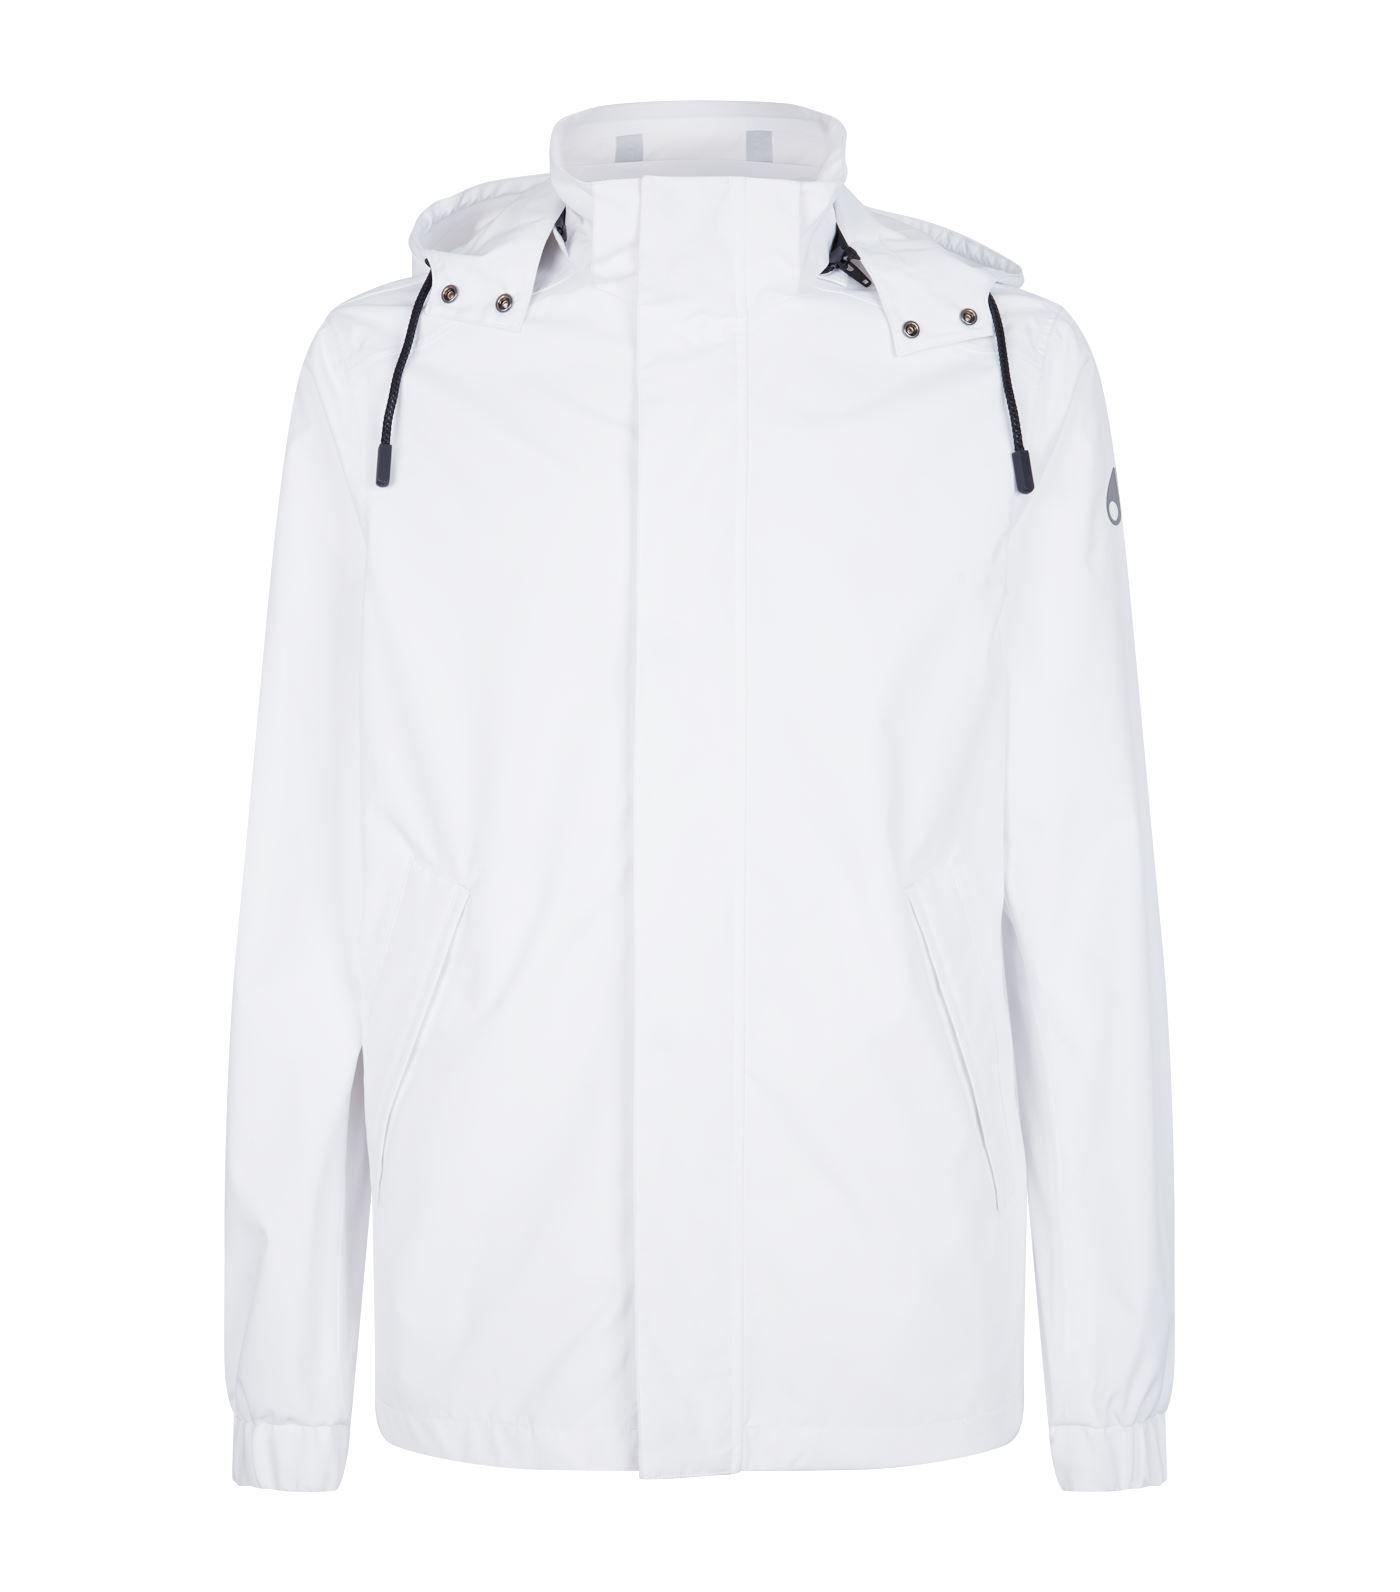 Moose Knuckles Hooded Jacket In White Modesens Hooded Jacket Jackets Hooded Jacket White [ 1592 x 1400 Pixel ]